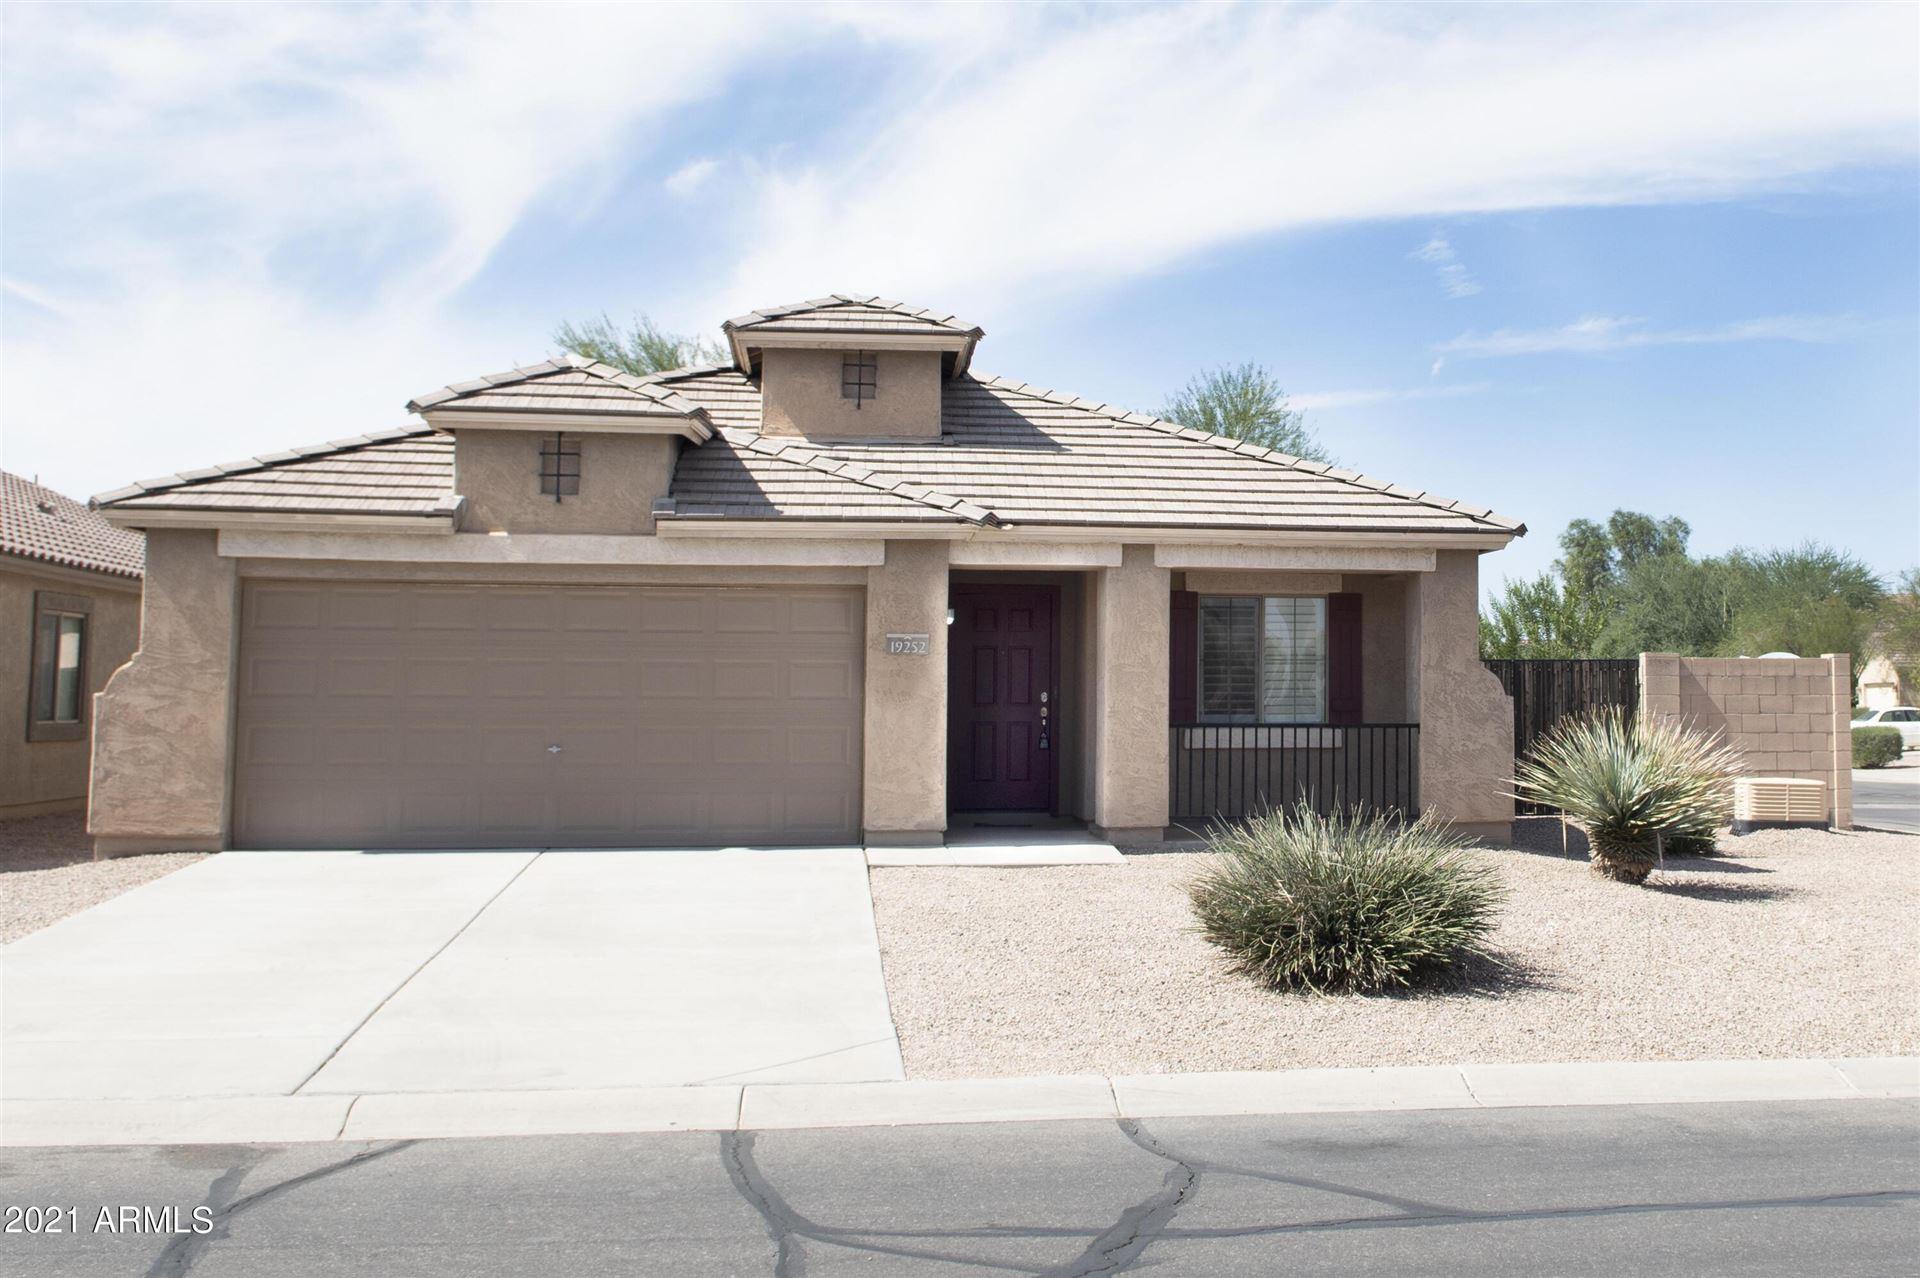 Photo for 19252 N MEGHAN Drive, Maricopa, AZ 85138 (MLS # 6284672)